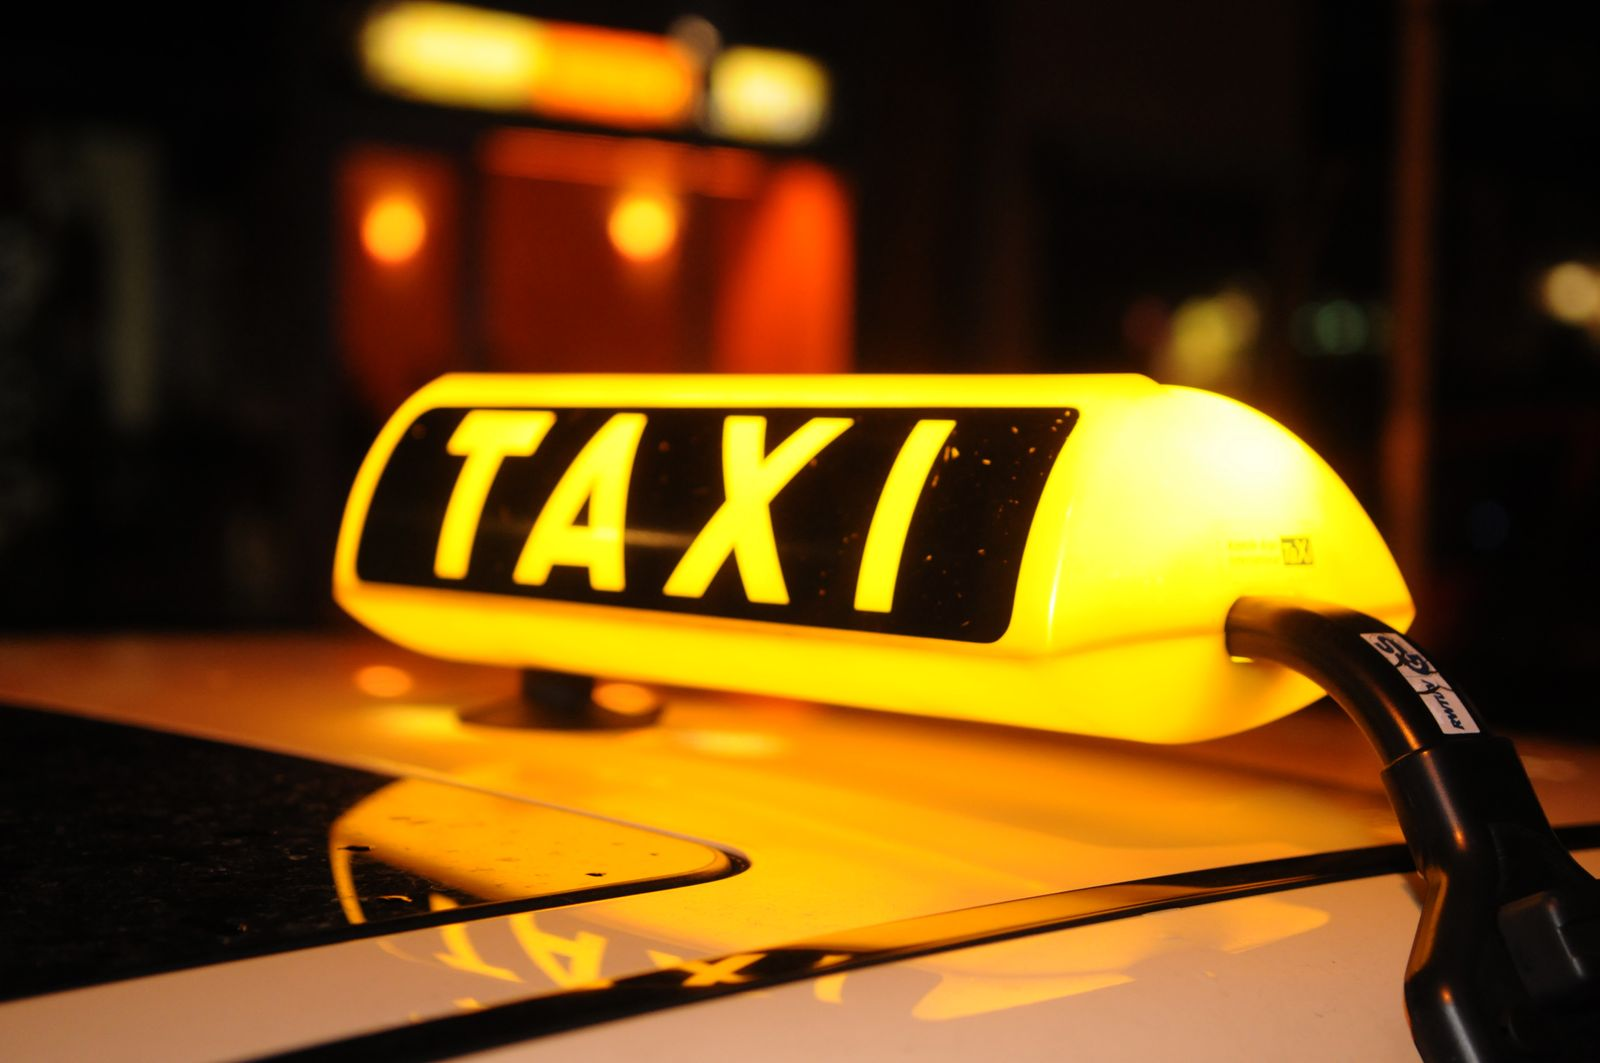 Taxi / Symbolbild